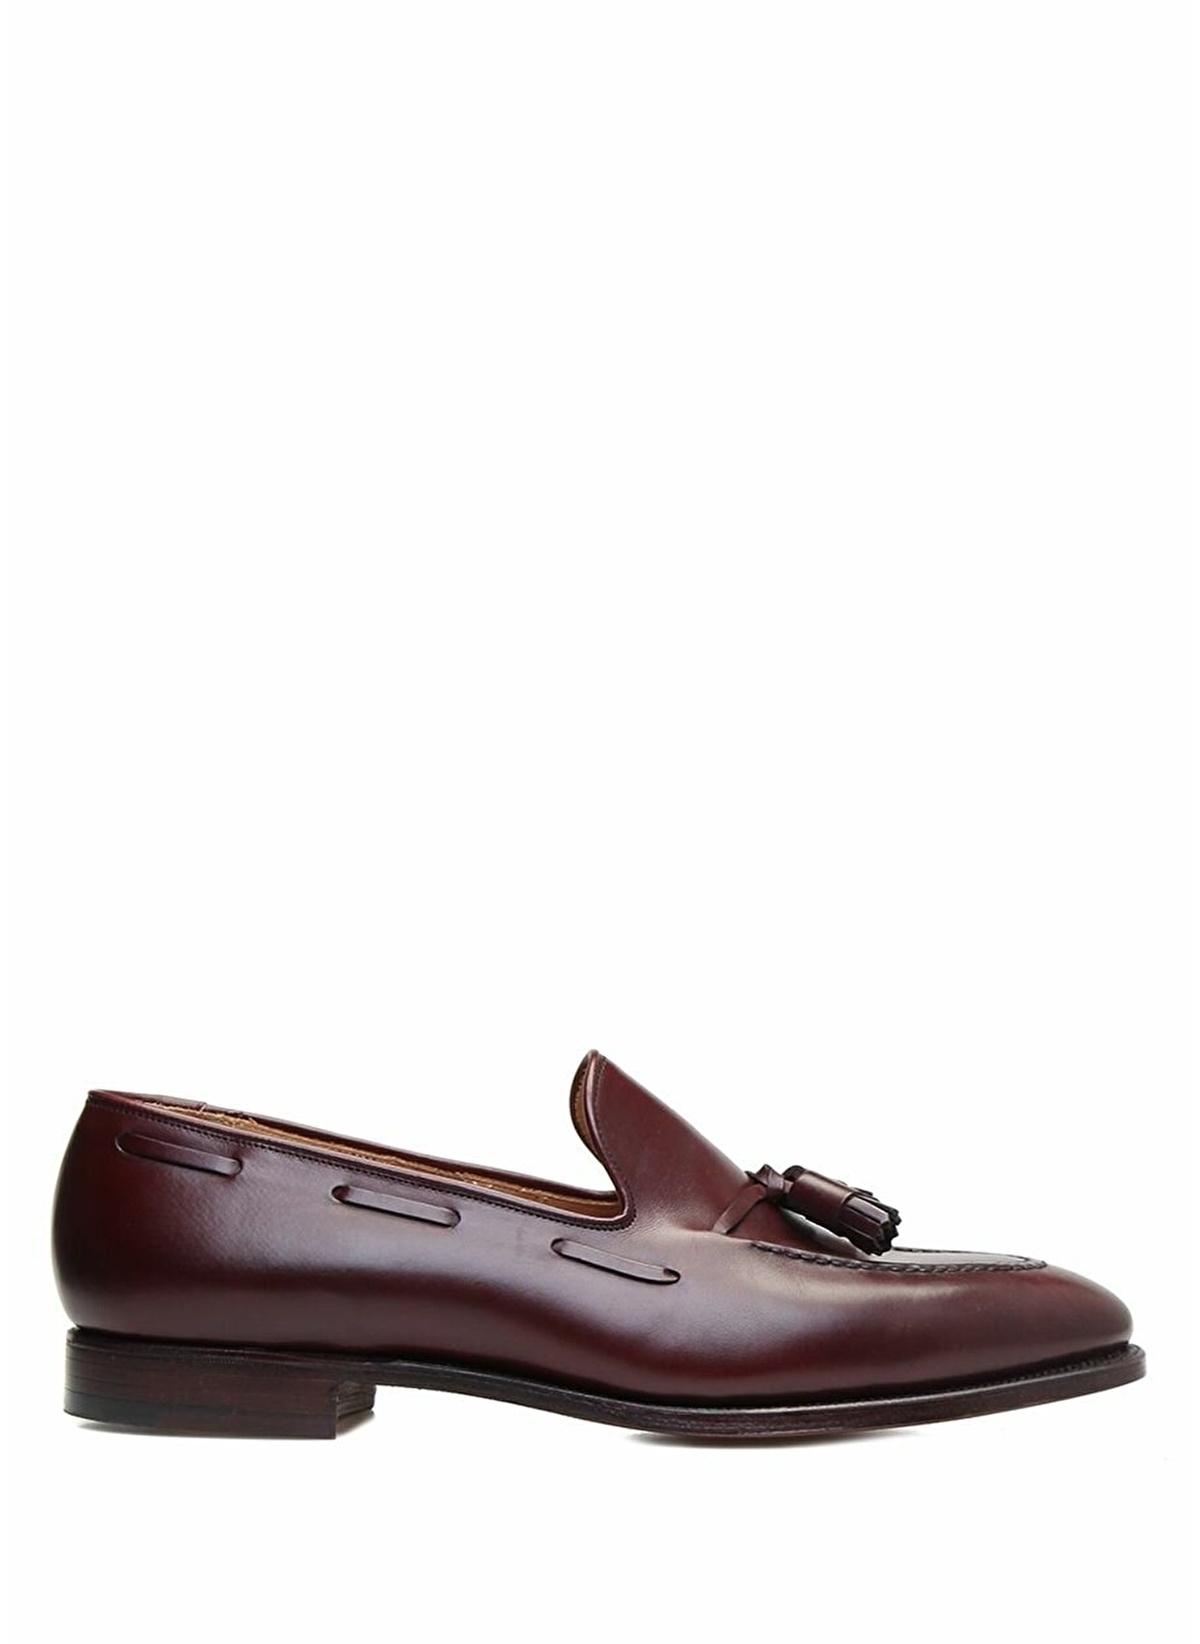 Crocket & Jones Ayakkabı 101010182-e-loafer – 2799.0 TL